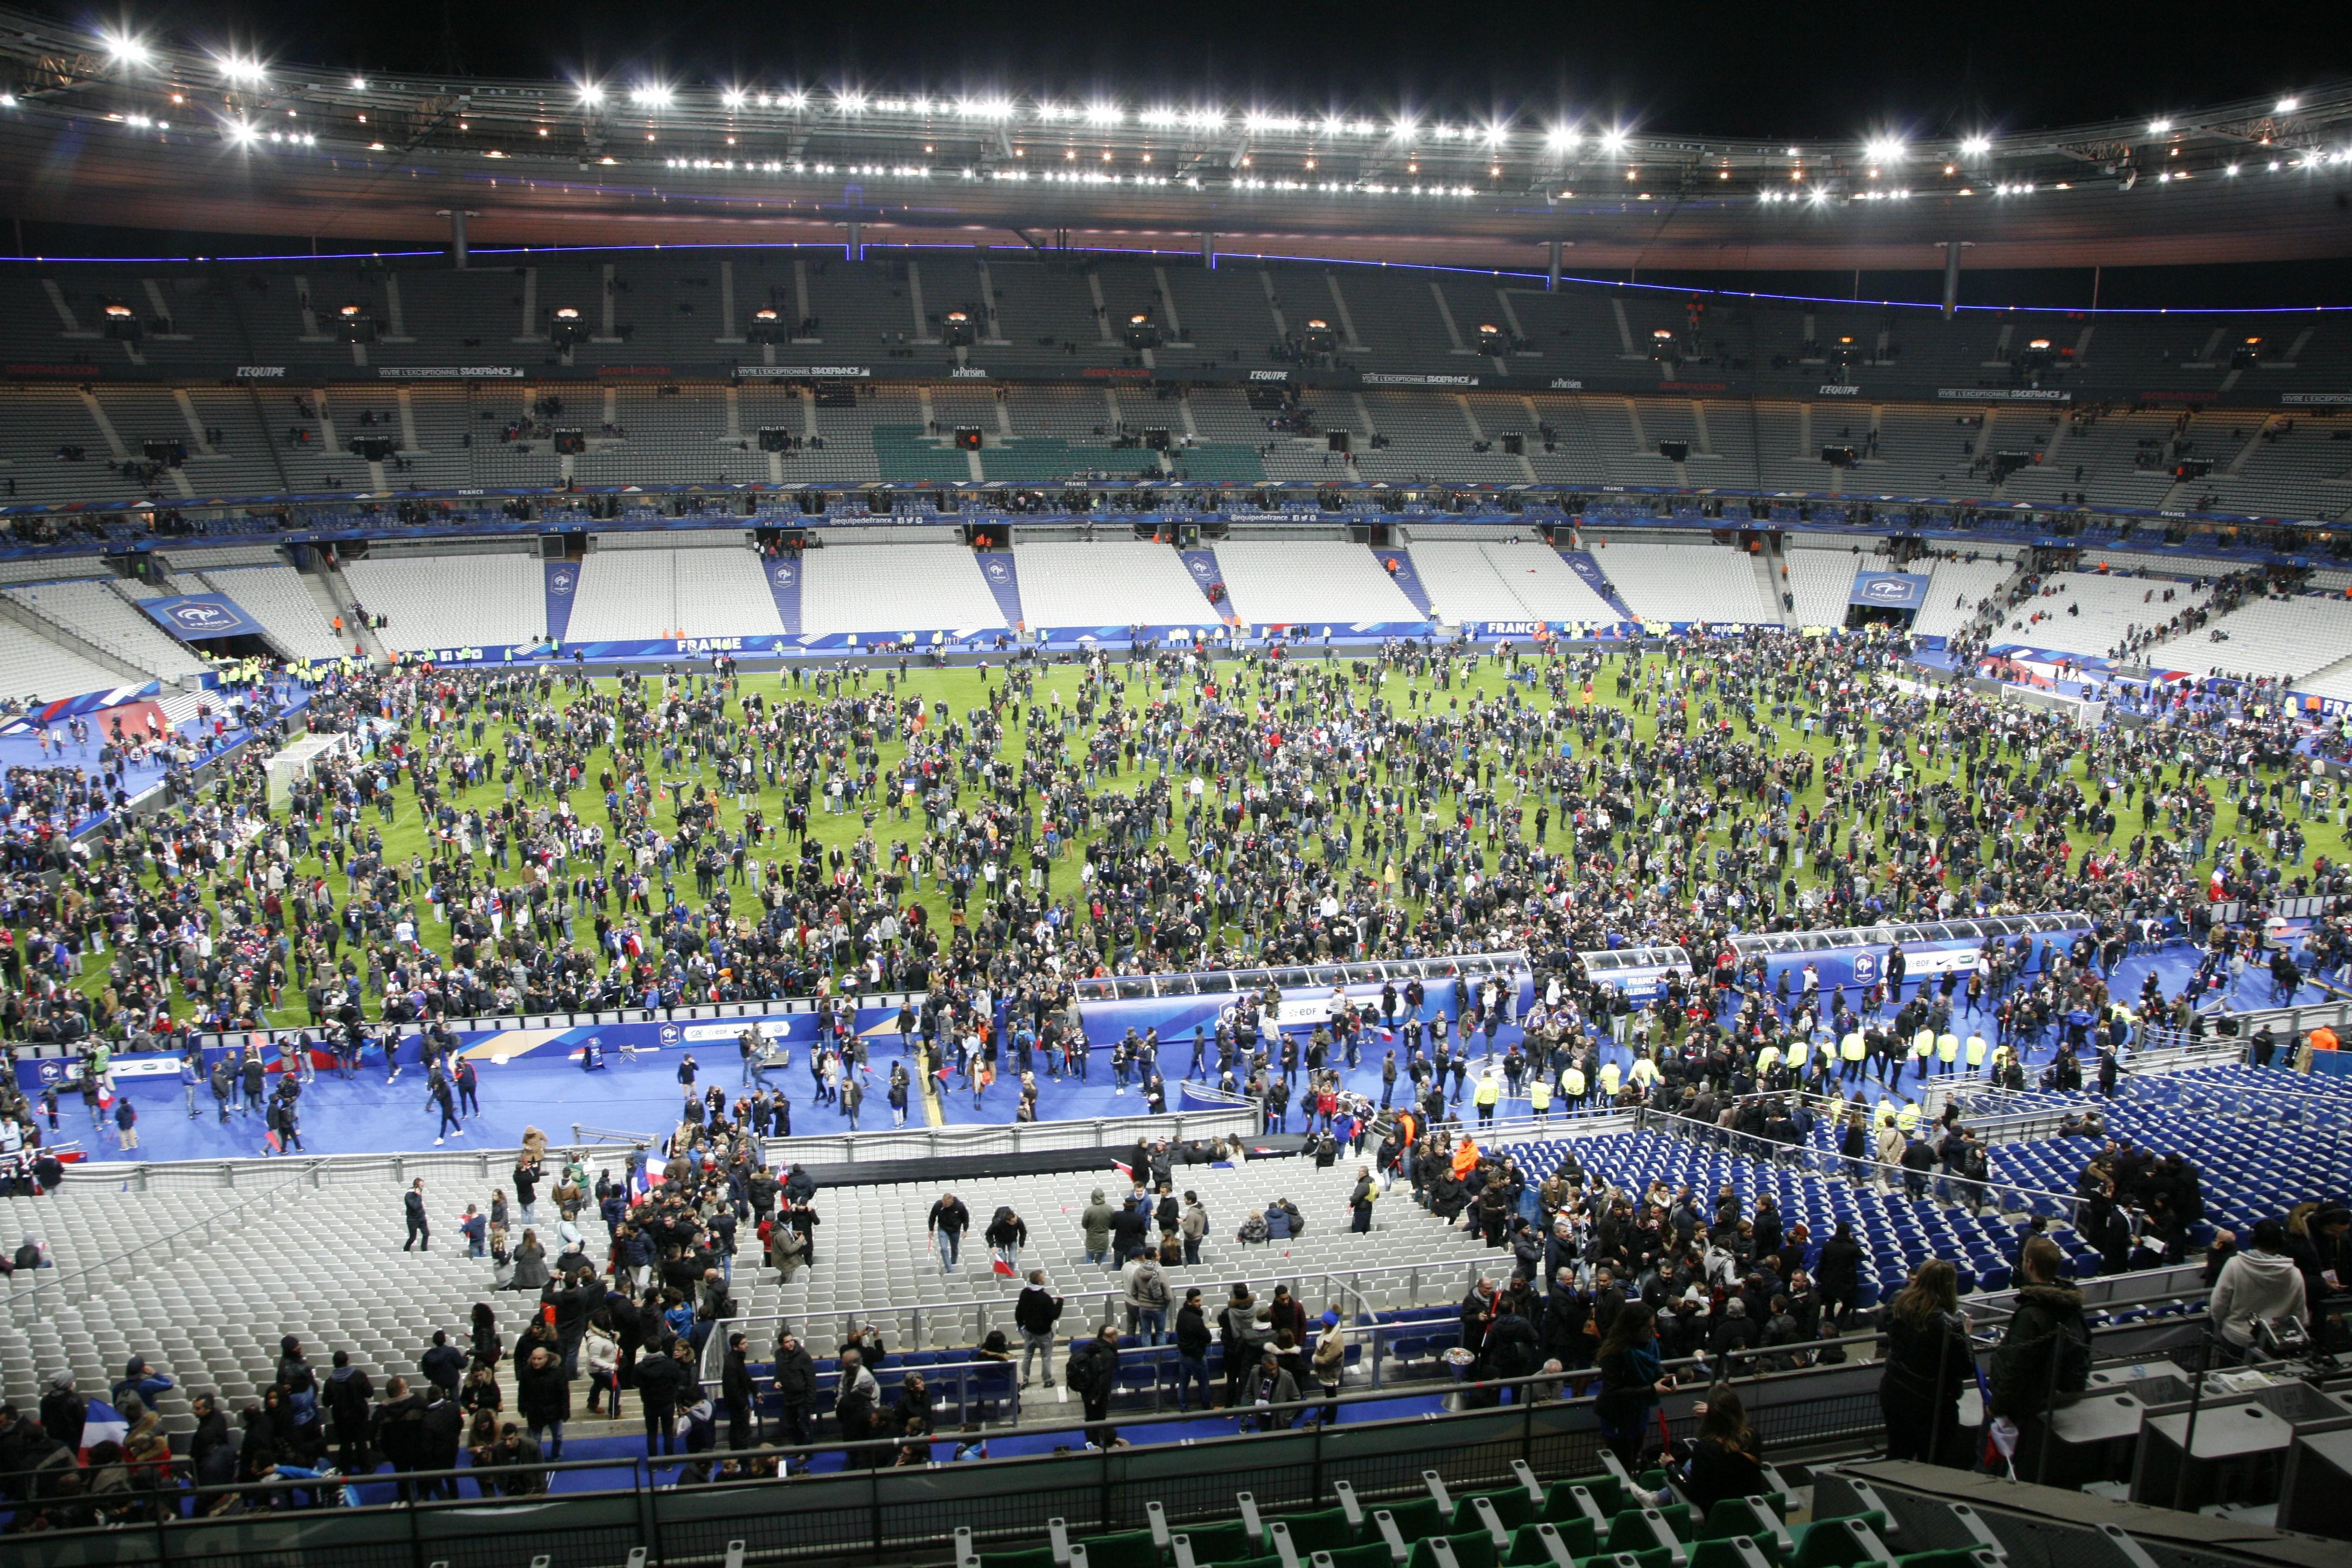 Spectators waited on the field of France's national stadium, the Stade de France